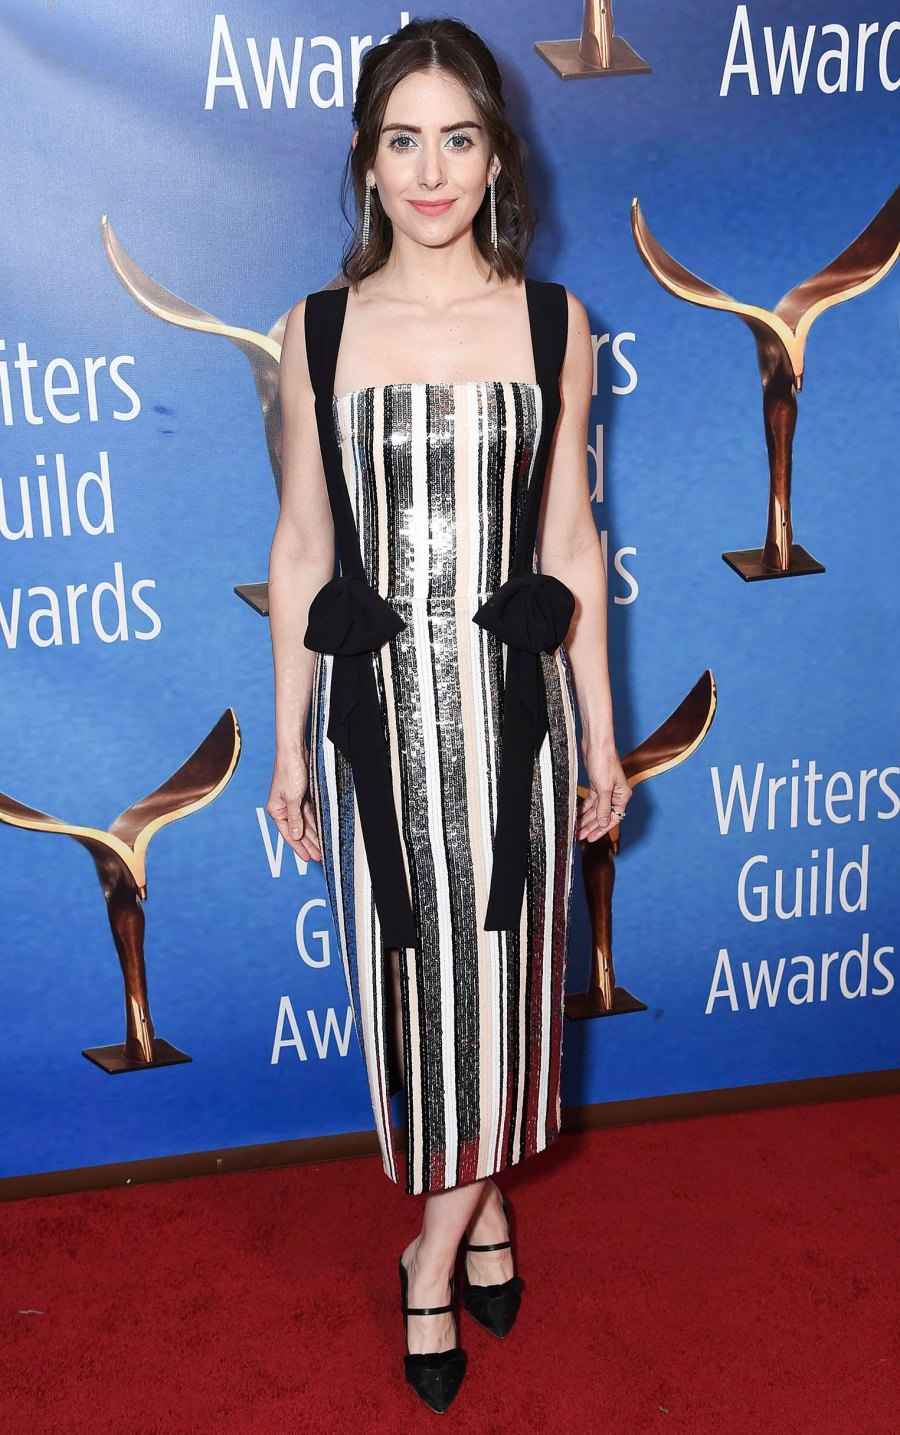 Celebs Wearing Stripes - Alison Brie February 17, 2019